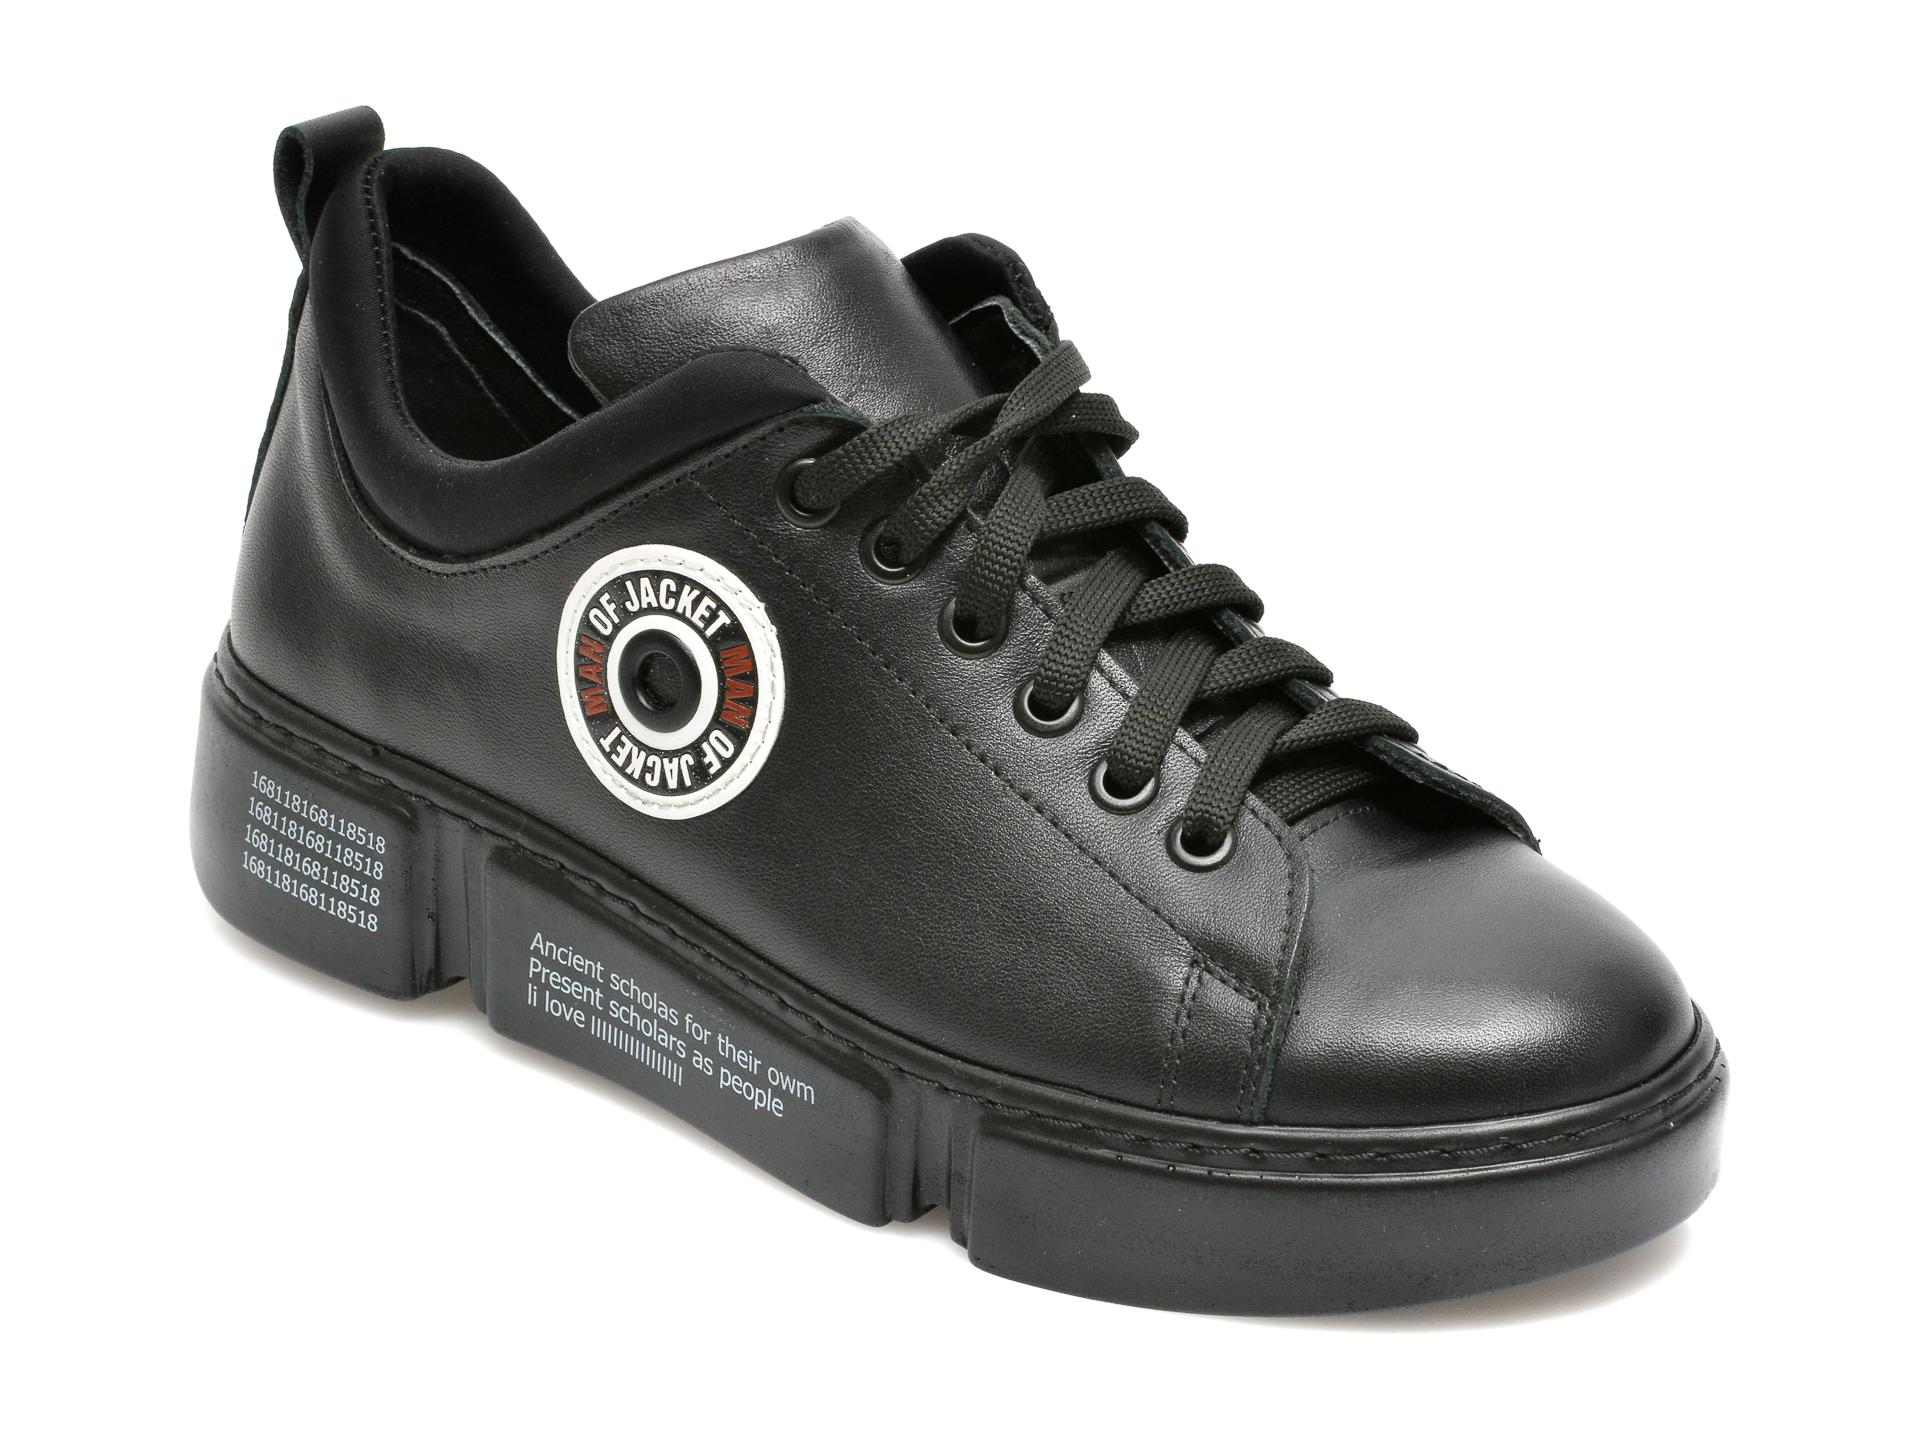 Pantofi Flavia Passini Negri, 12510, Din Piele Naturala